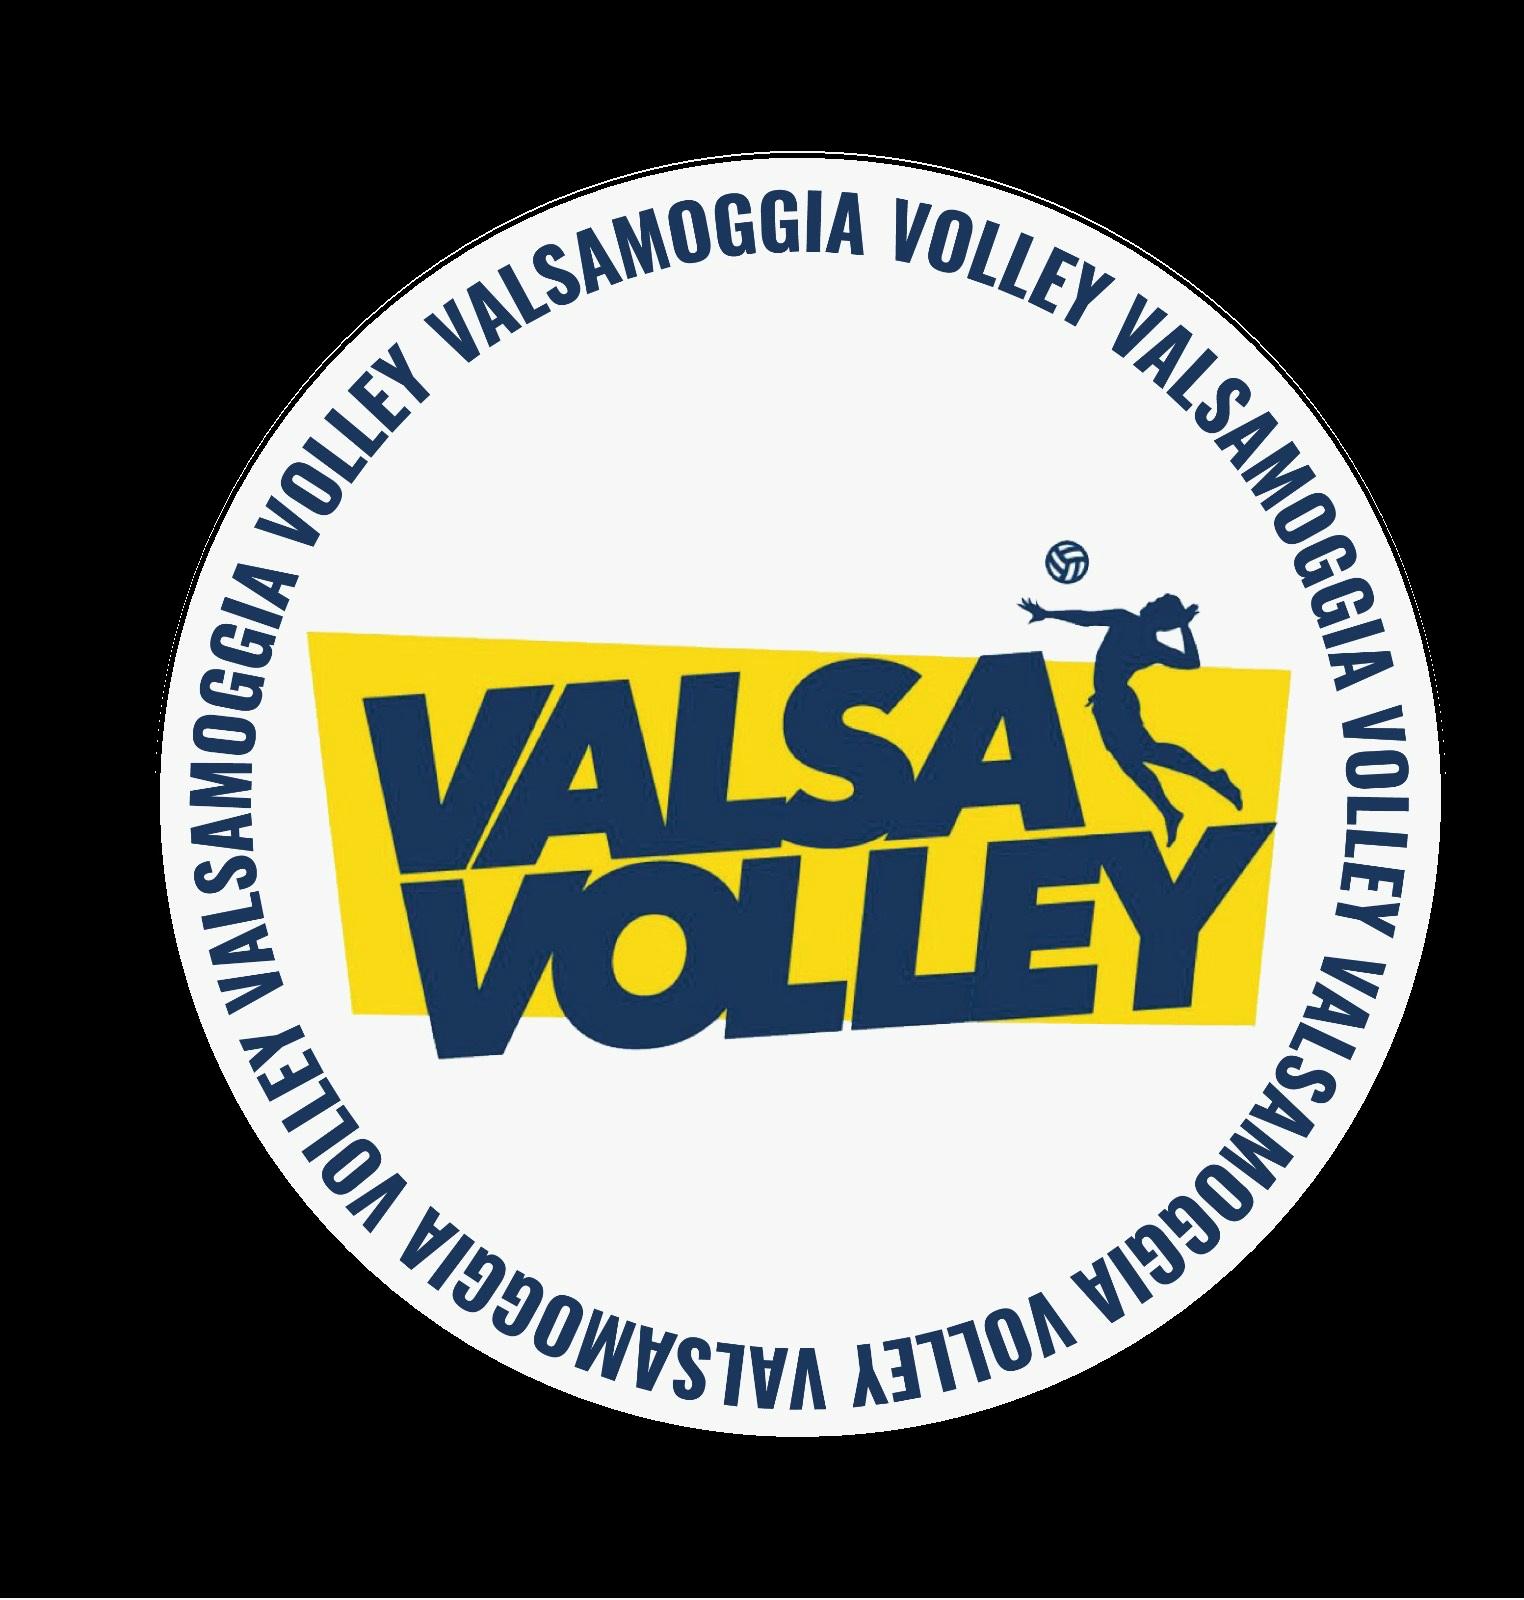 Stemma Valsamoggia Volley